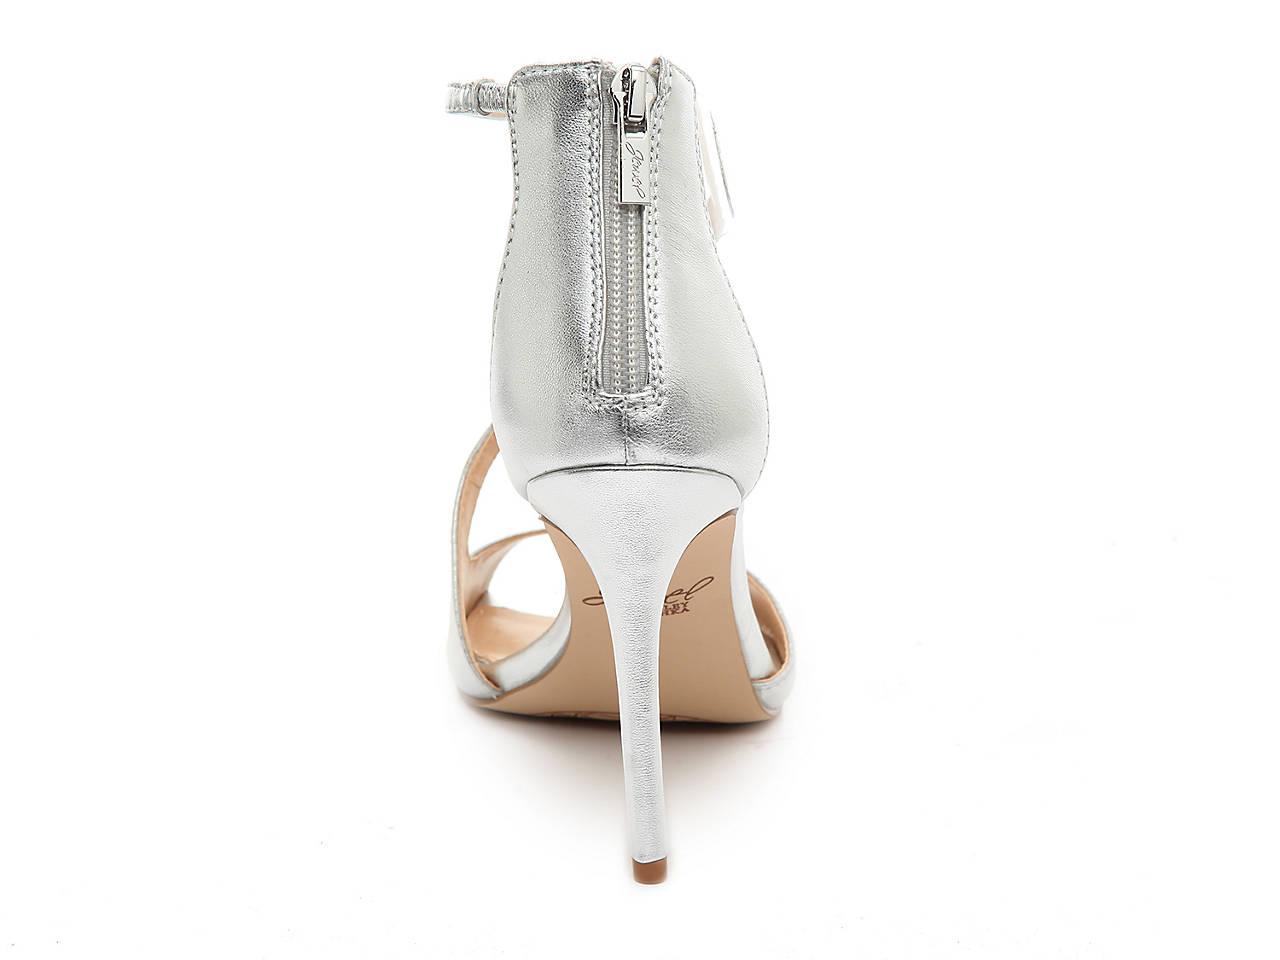 8d67699cf81 Jewel Badgley Mischka Tayler Sandal Women s Shoes